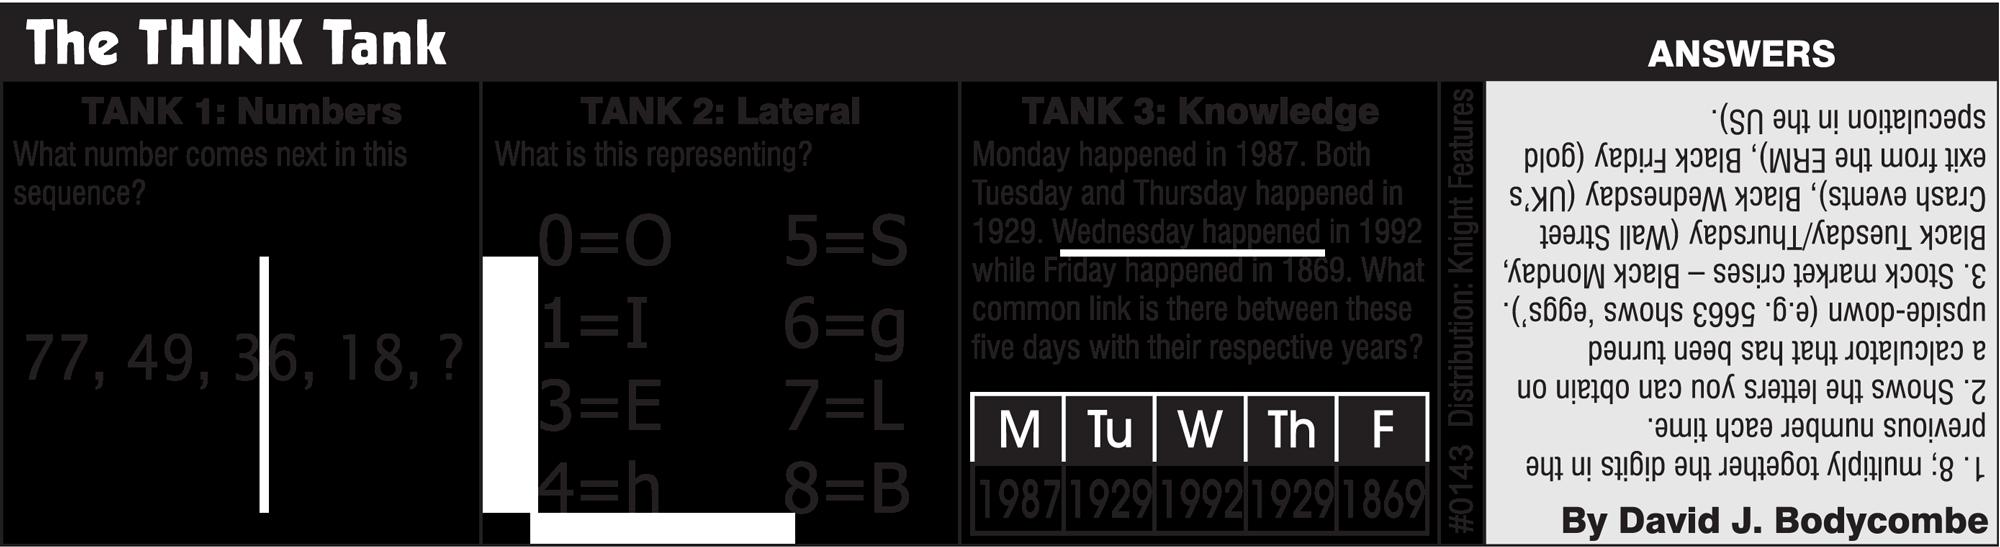 tnk0143b.png